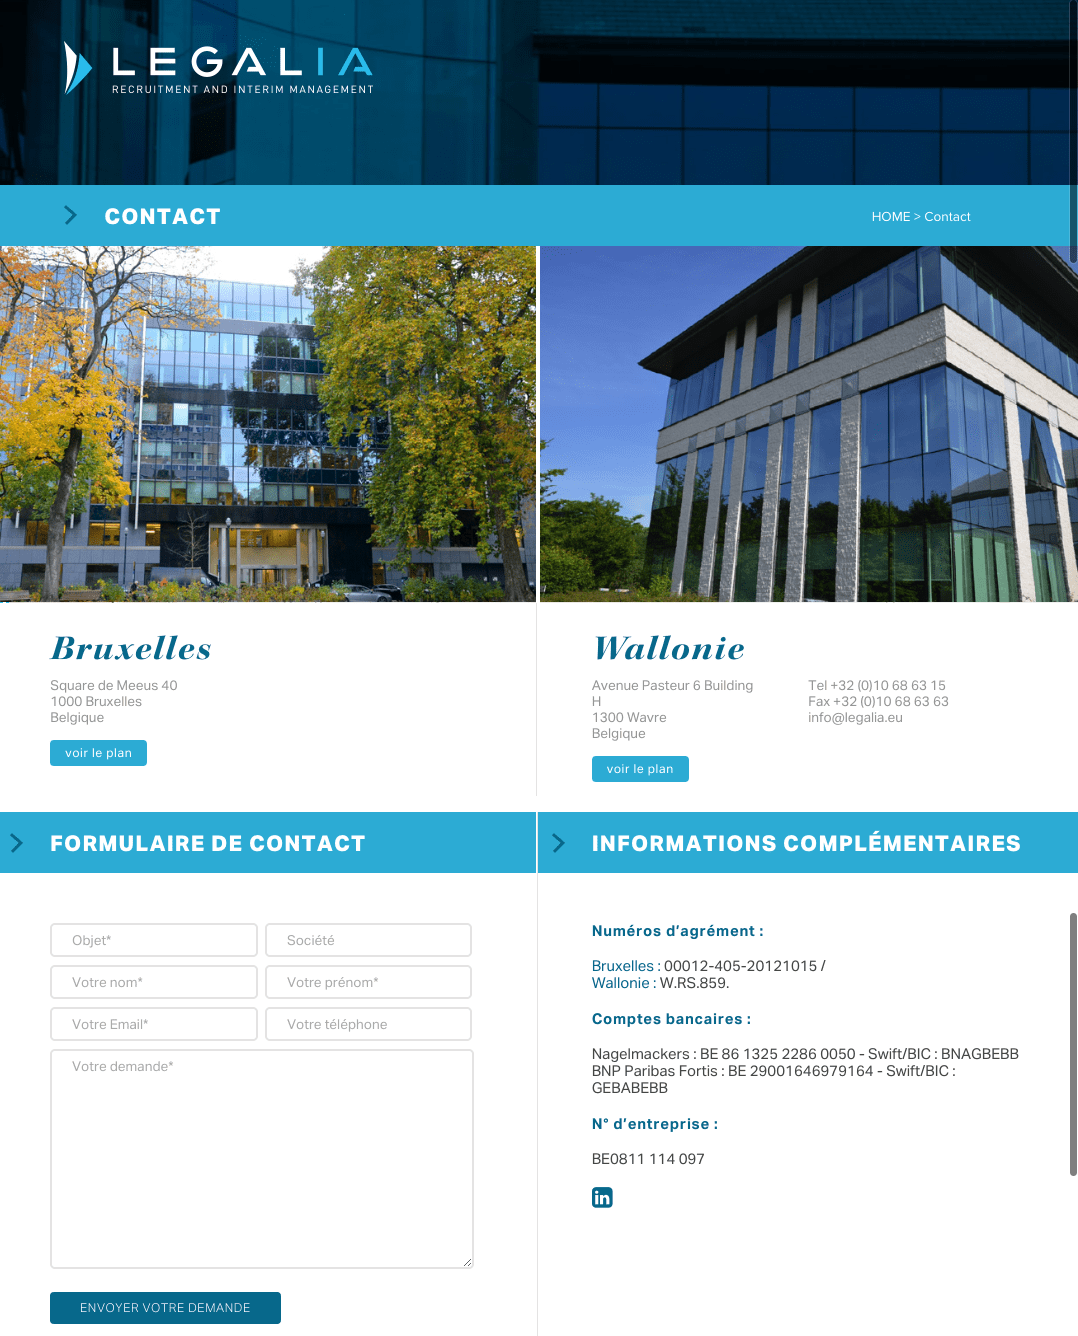 legalia-contact-us-page